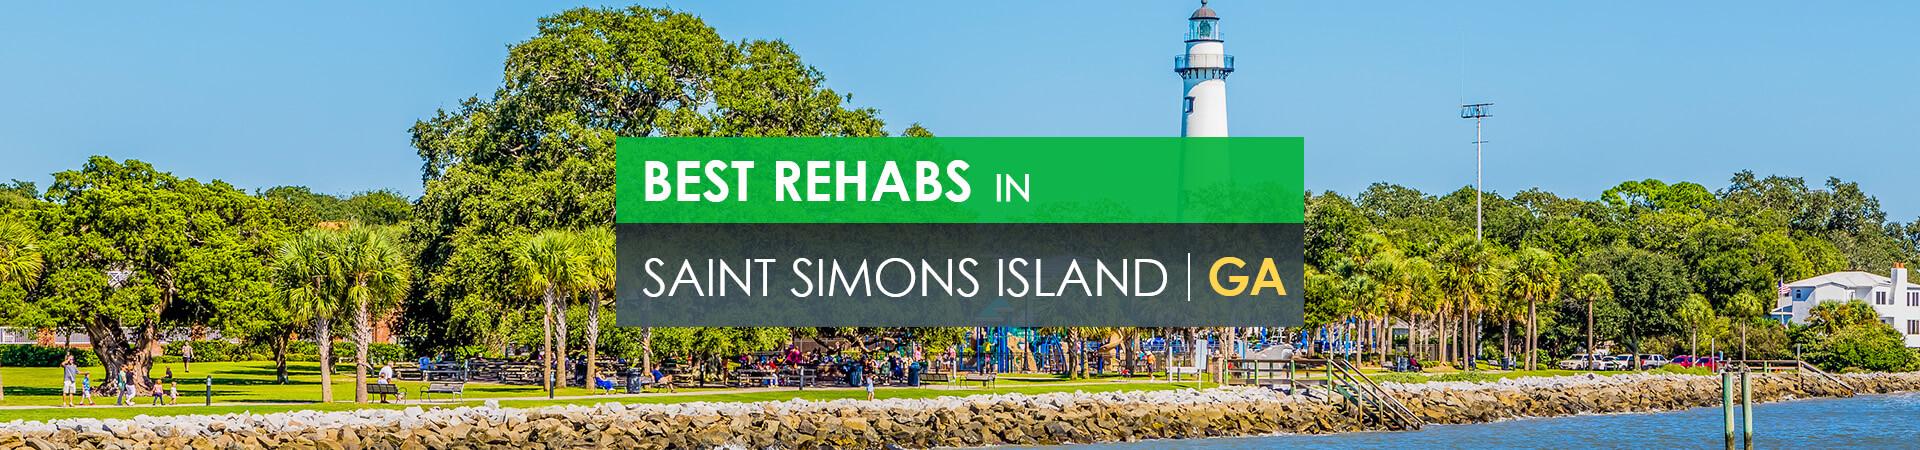 Best rehabs in Saint Simons Island, GA